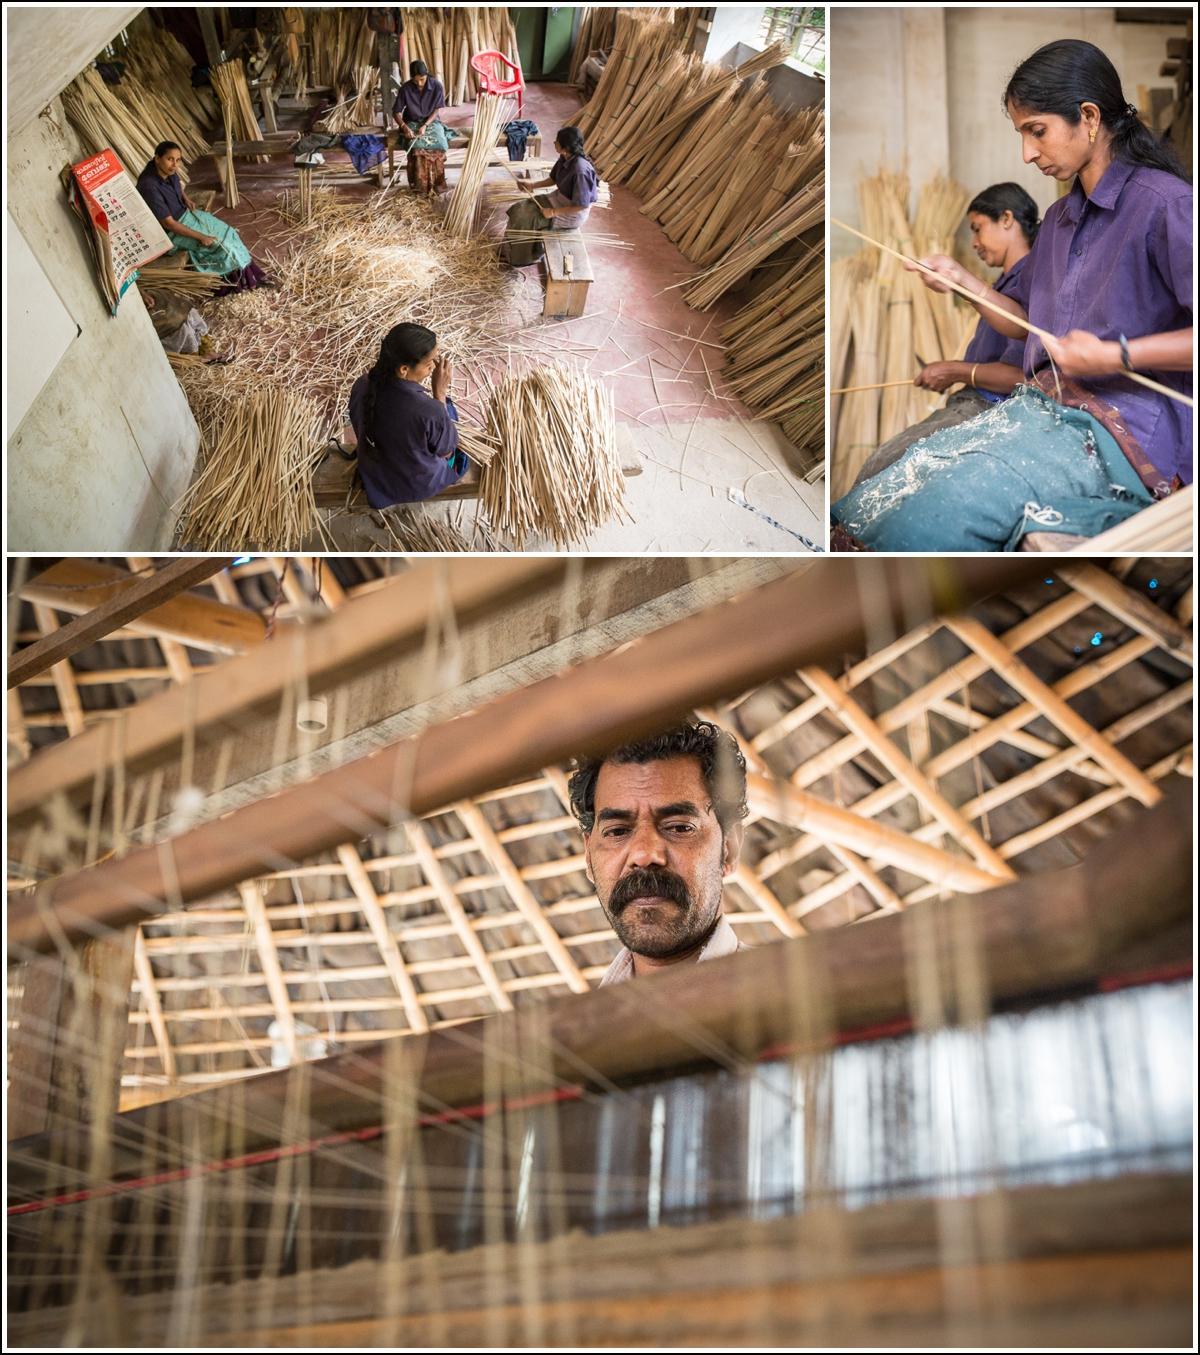 bamboo-village-uravu-india